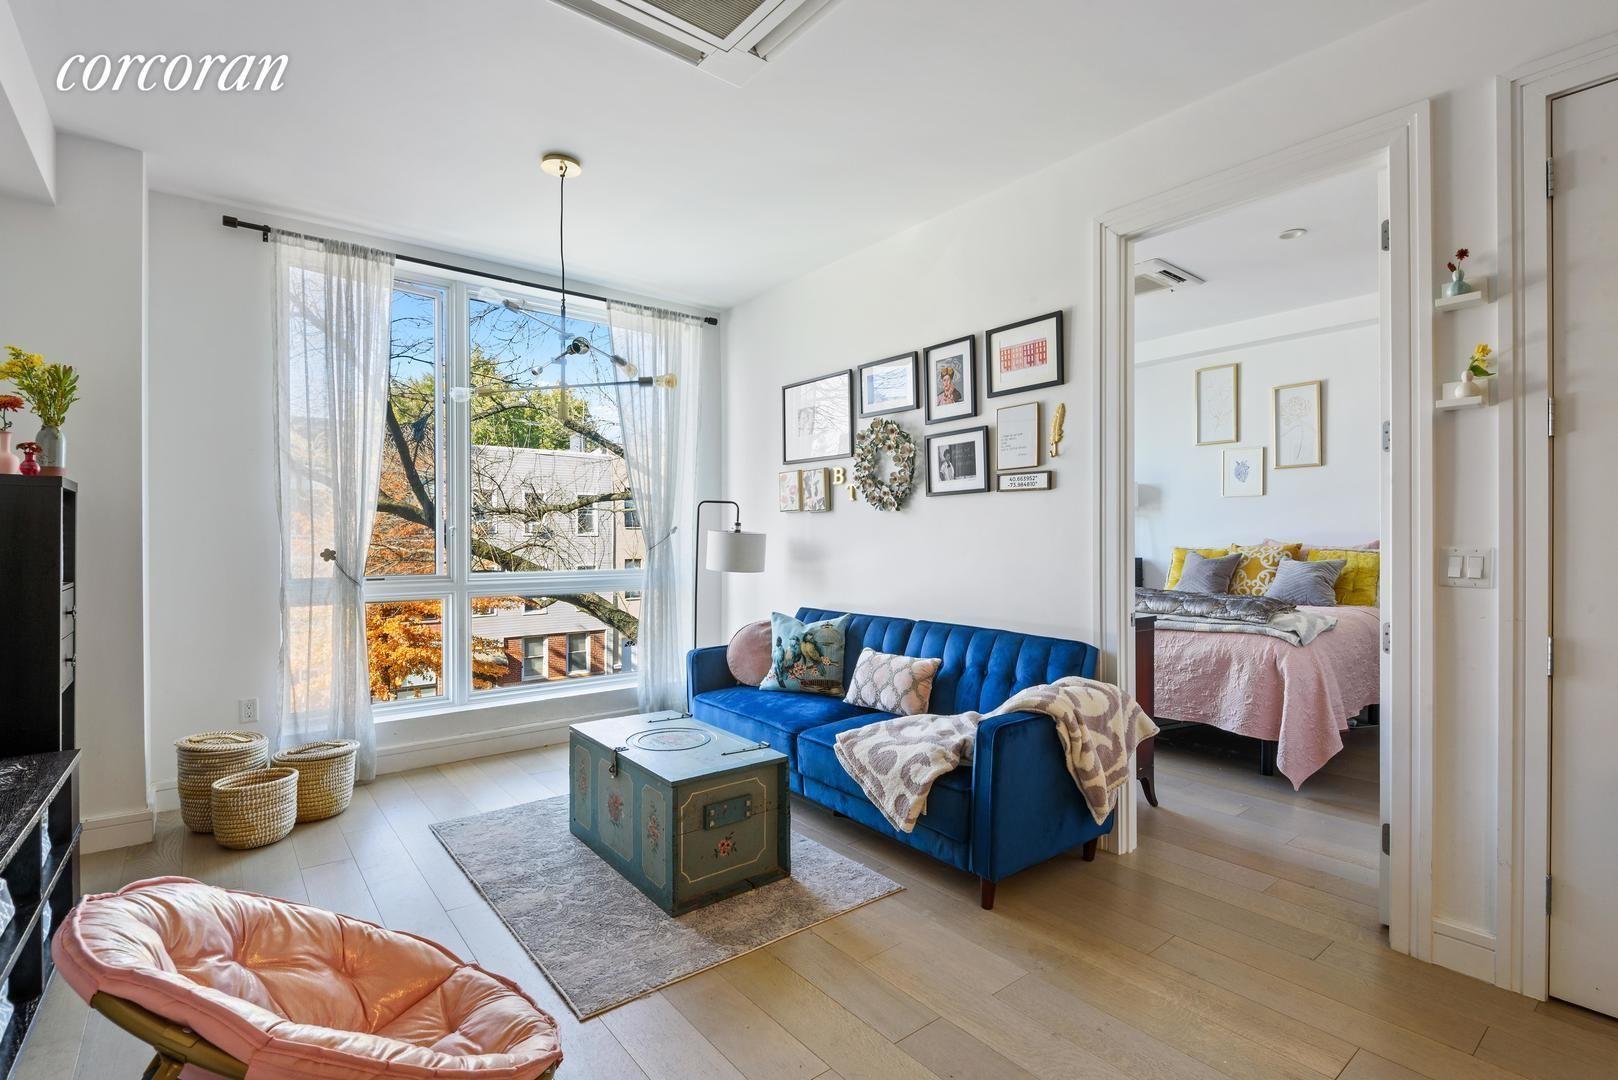 Apartment for sale at 695 6th Avenue, Apt 2C